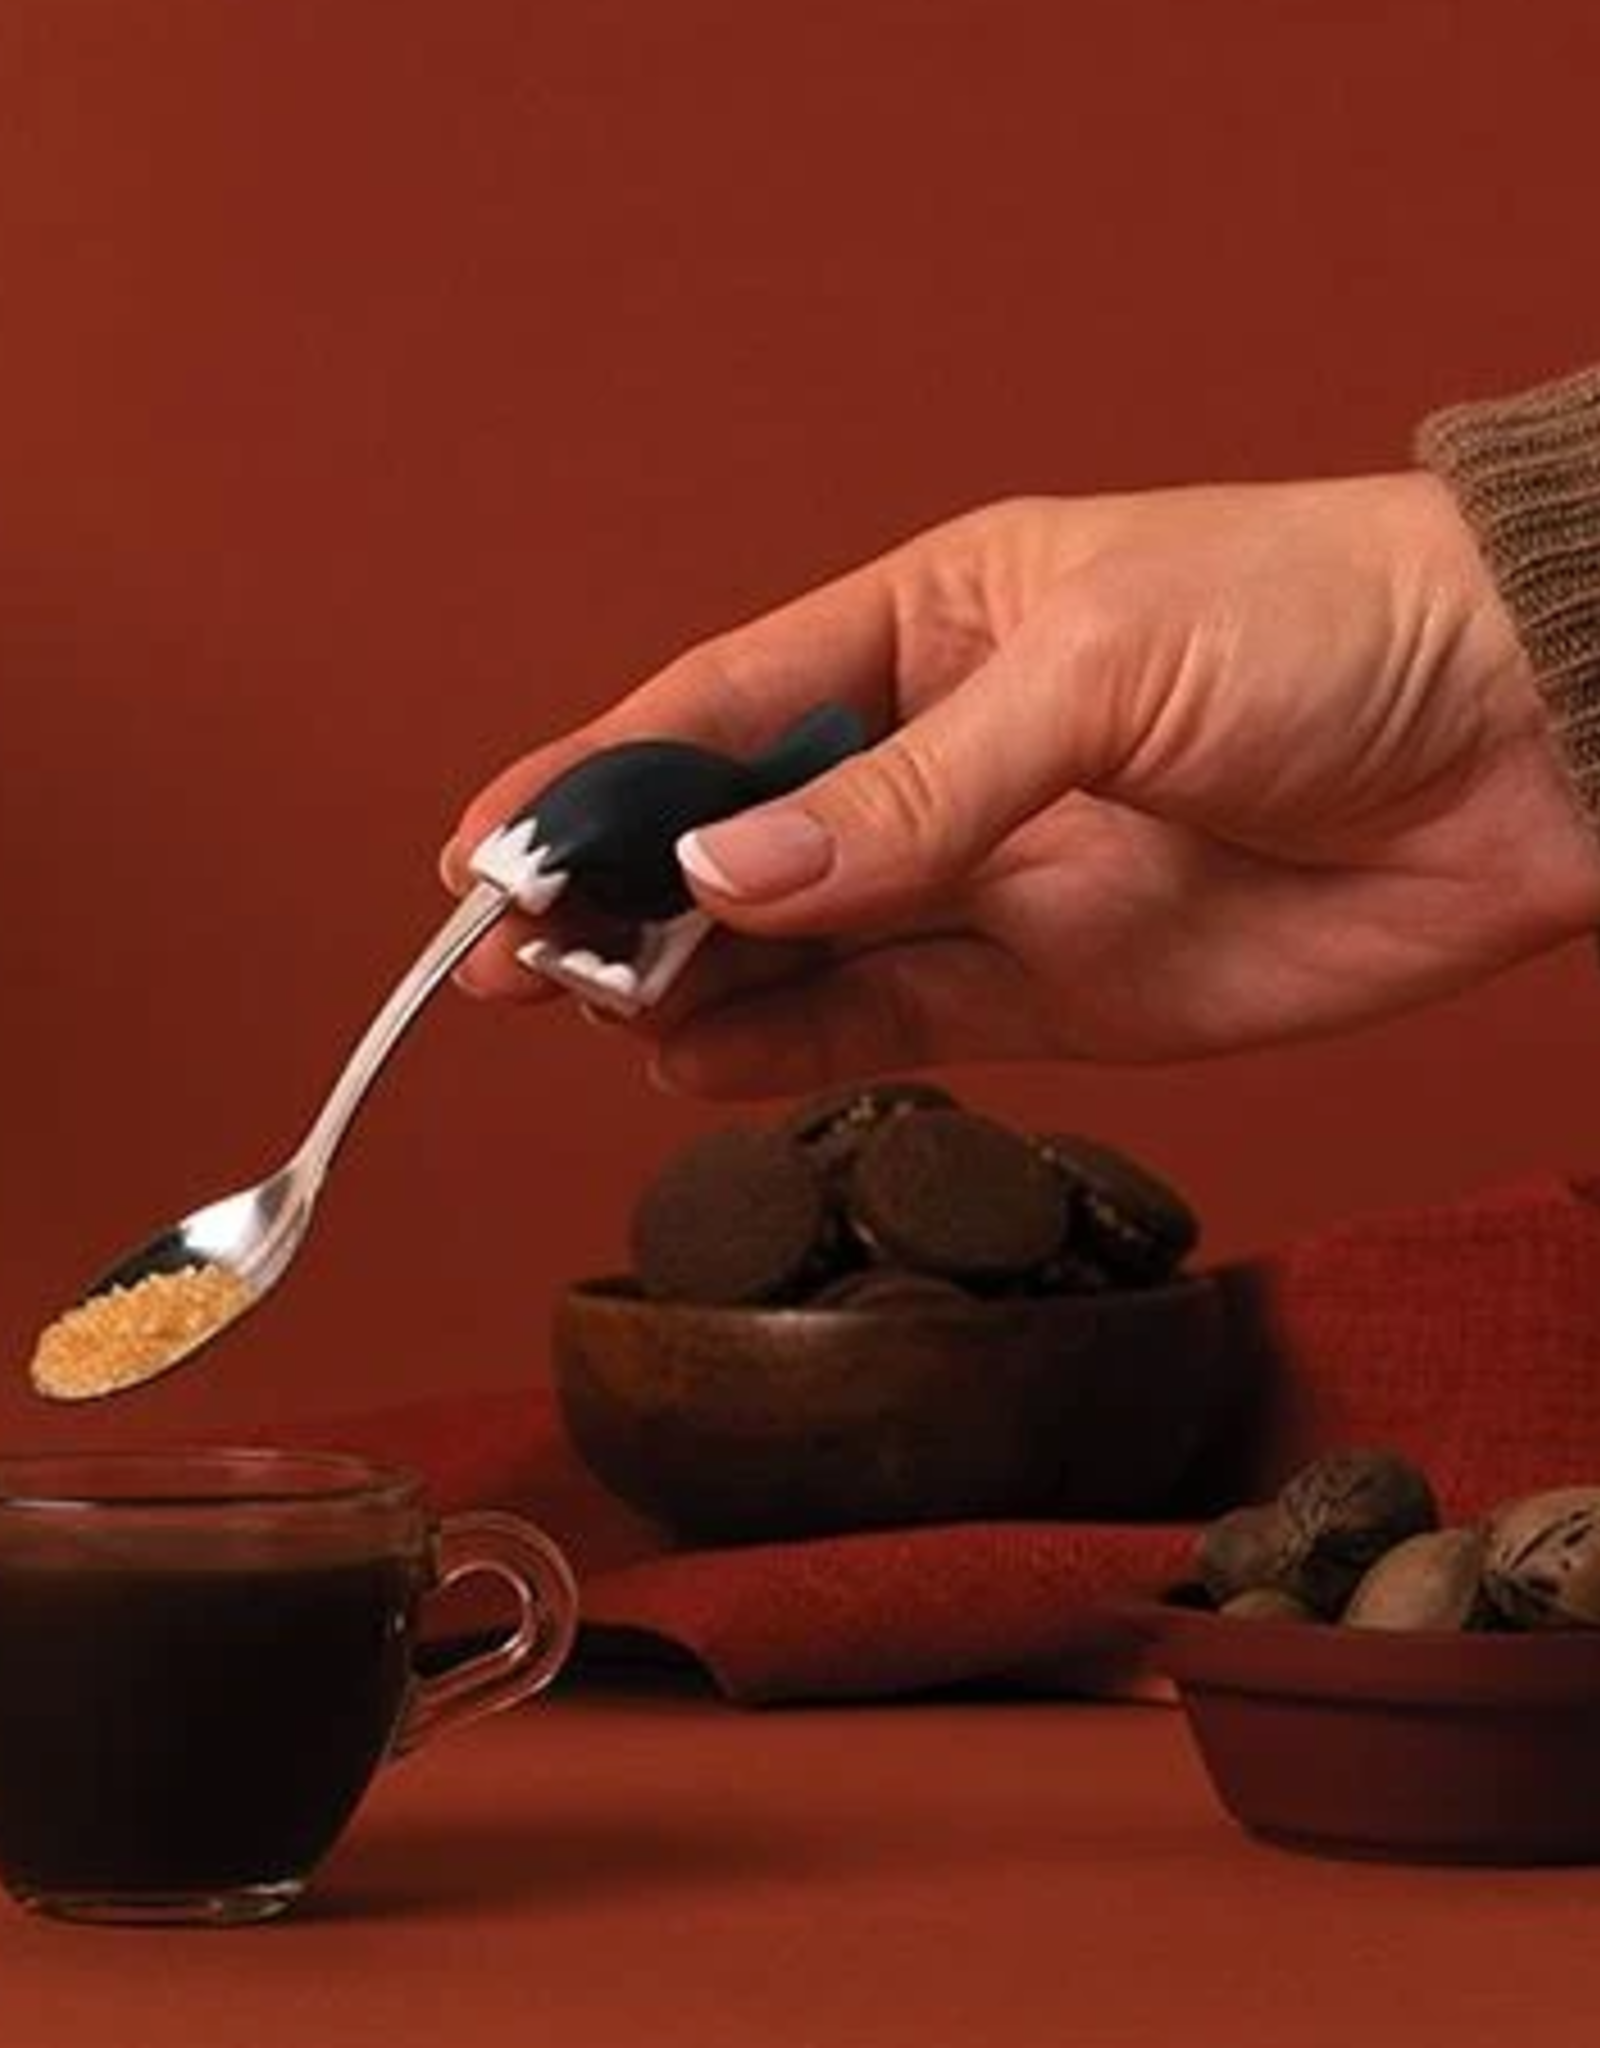 abodee sweetie sugarspoon